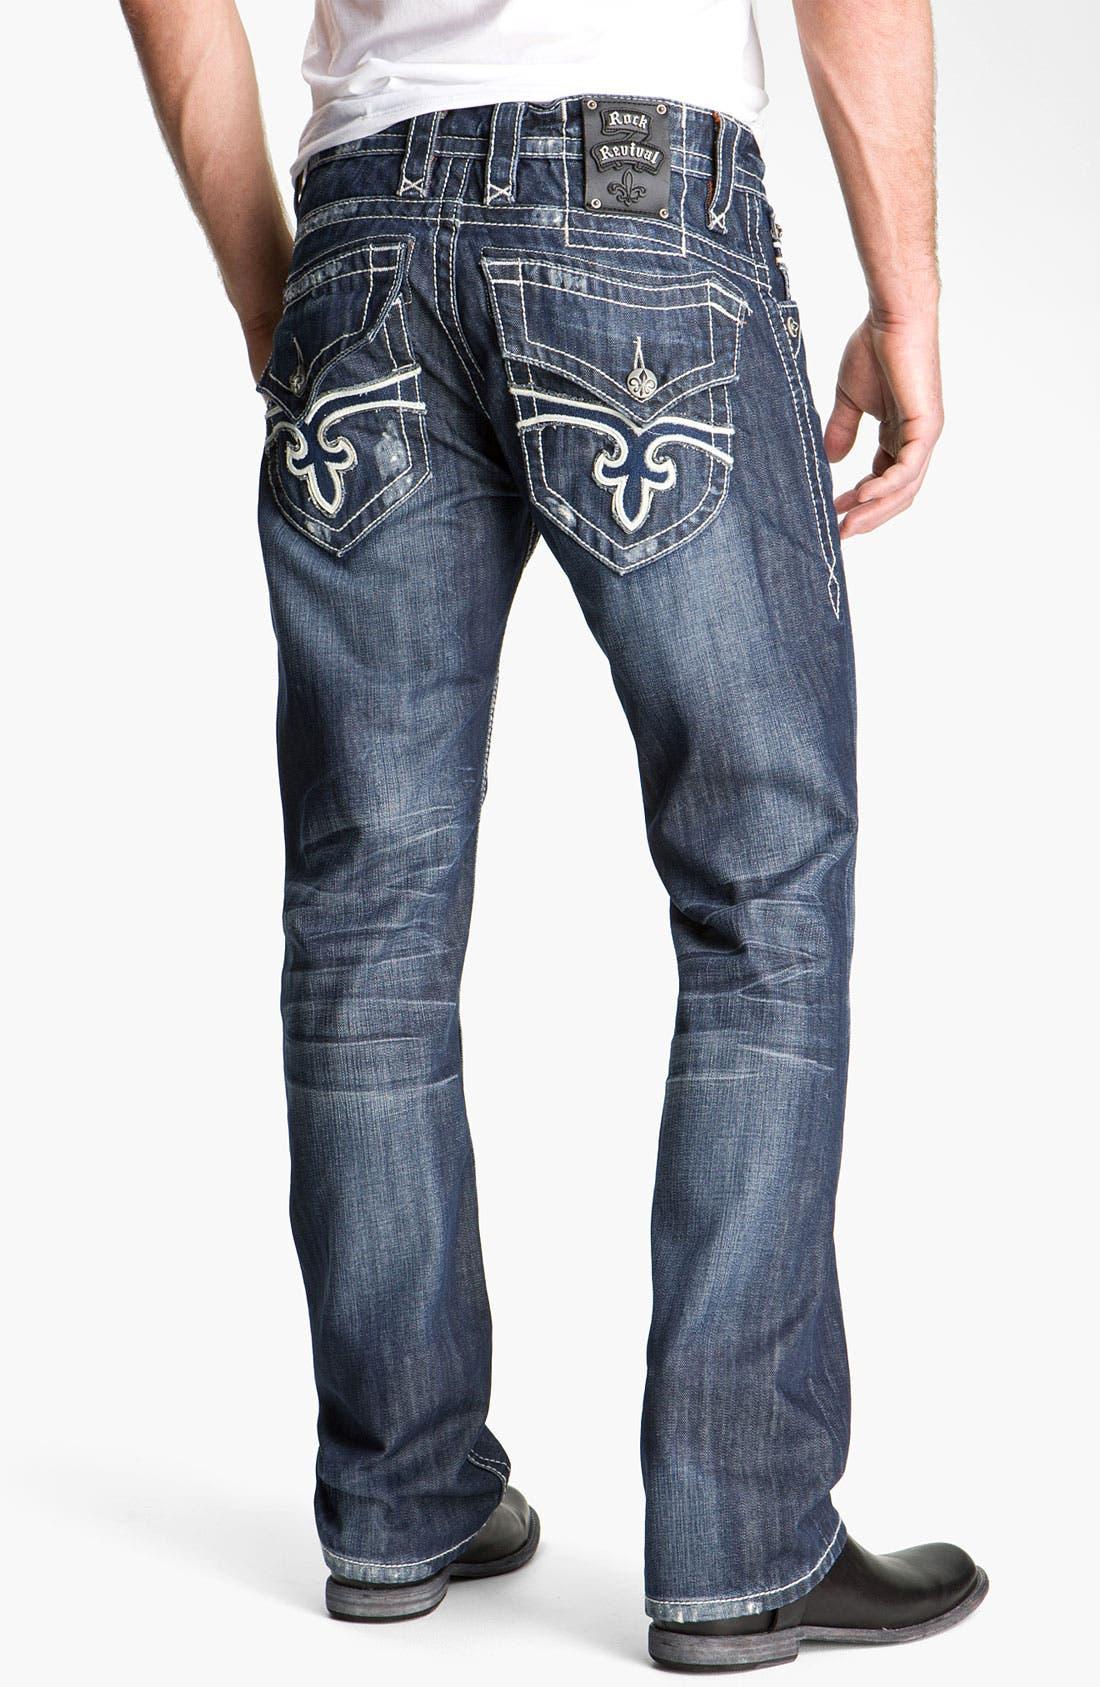 Alternate Image 1 Selected - Rock Revival 'Paul' Straight Leg Jeans (Blue)